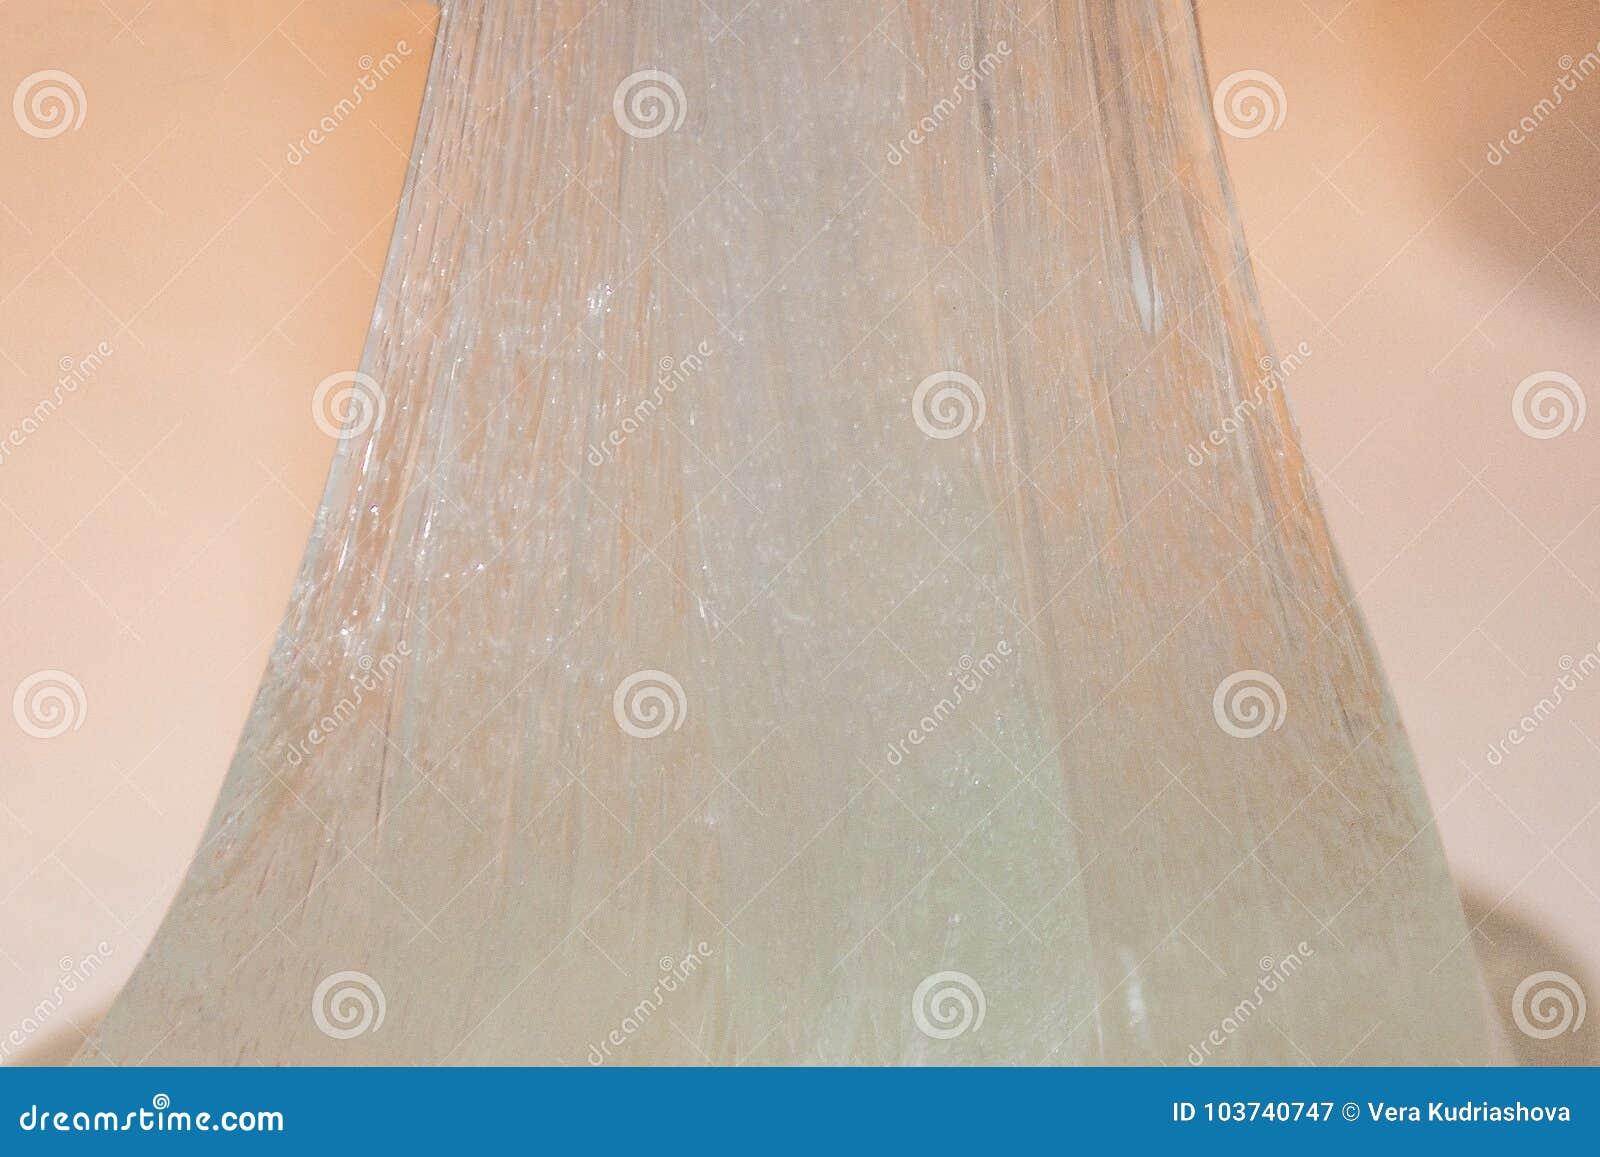 Que son las flemas transparentes